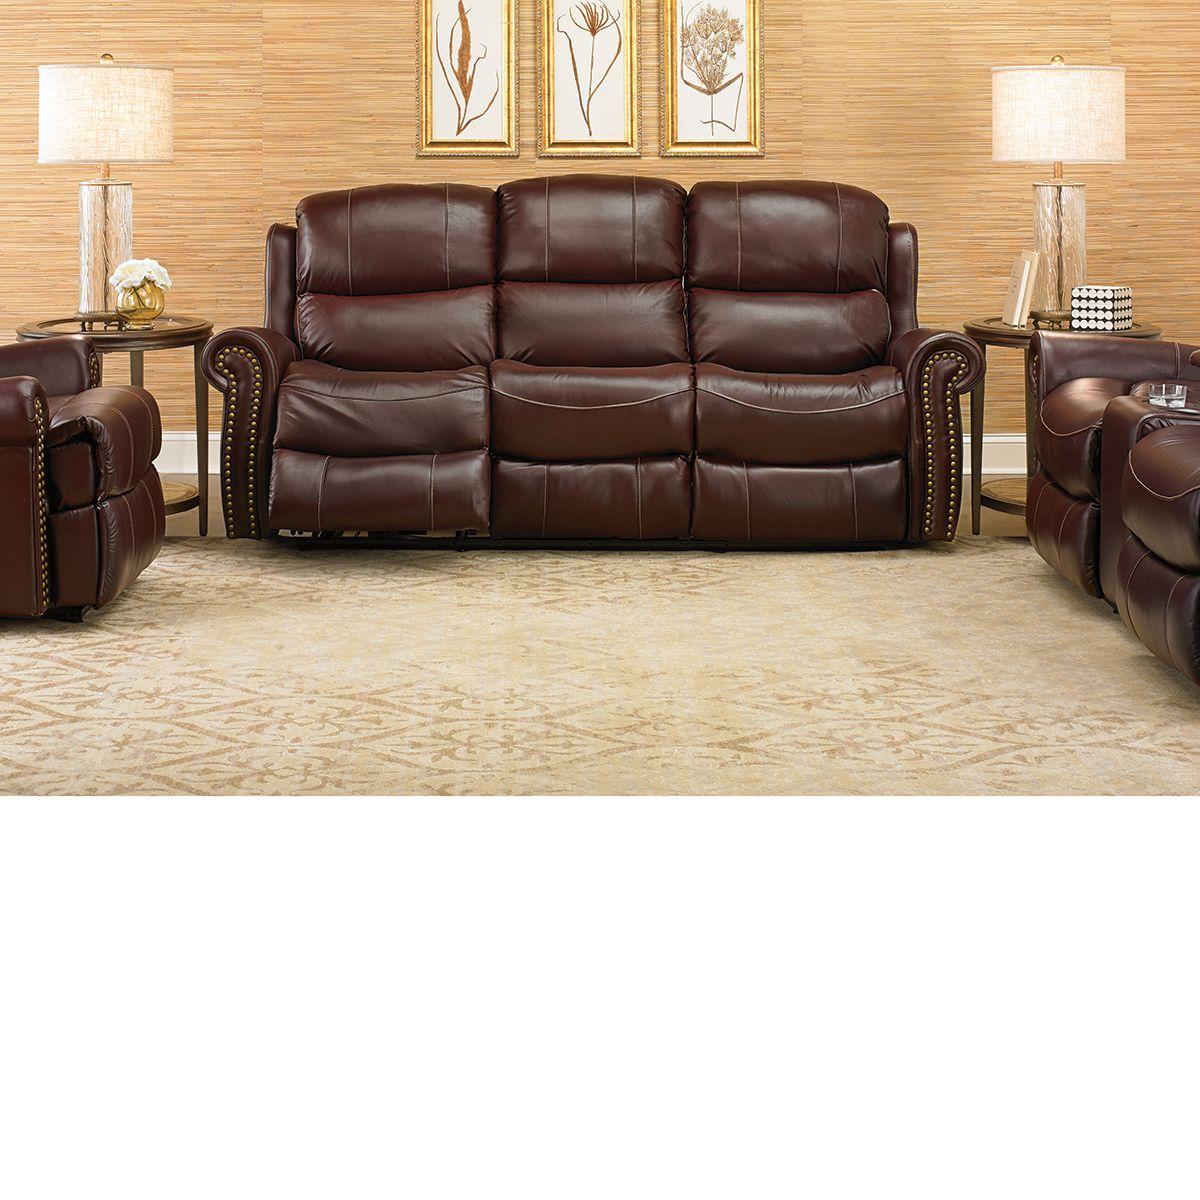 The Dump Furniture Dual Okin Power Reclining Sofa Love